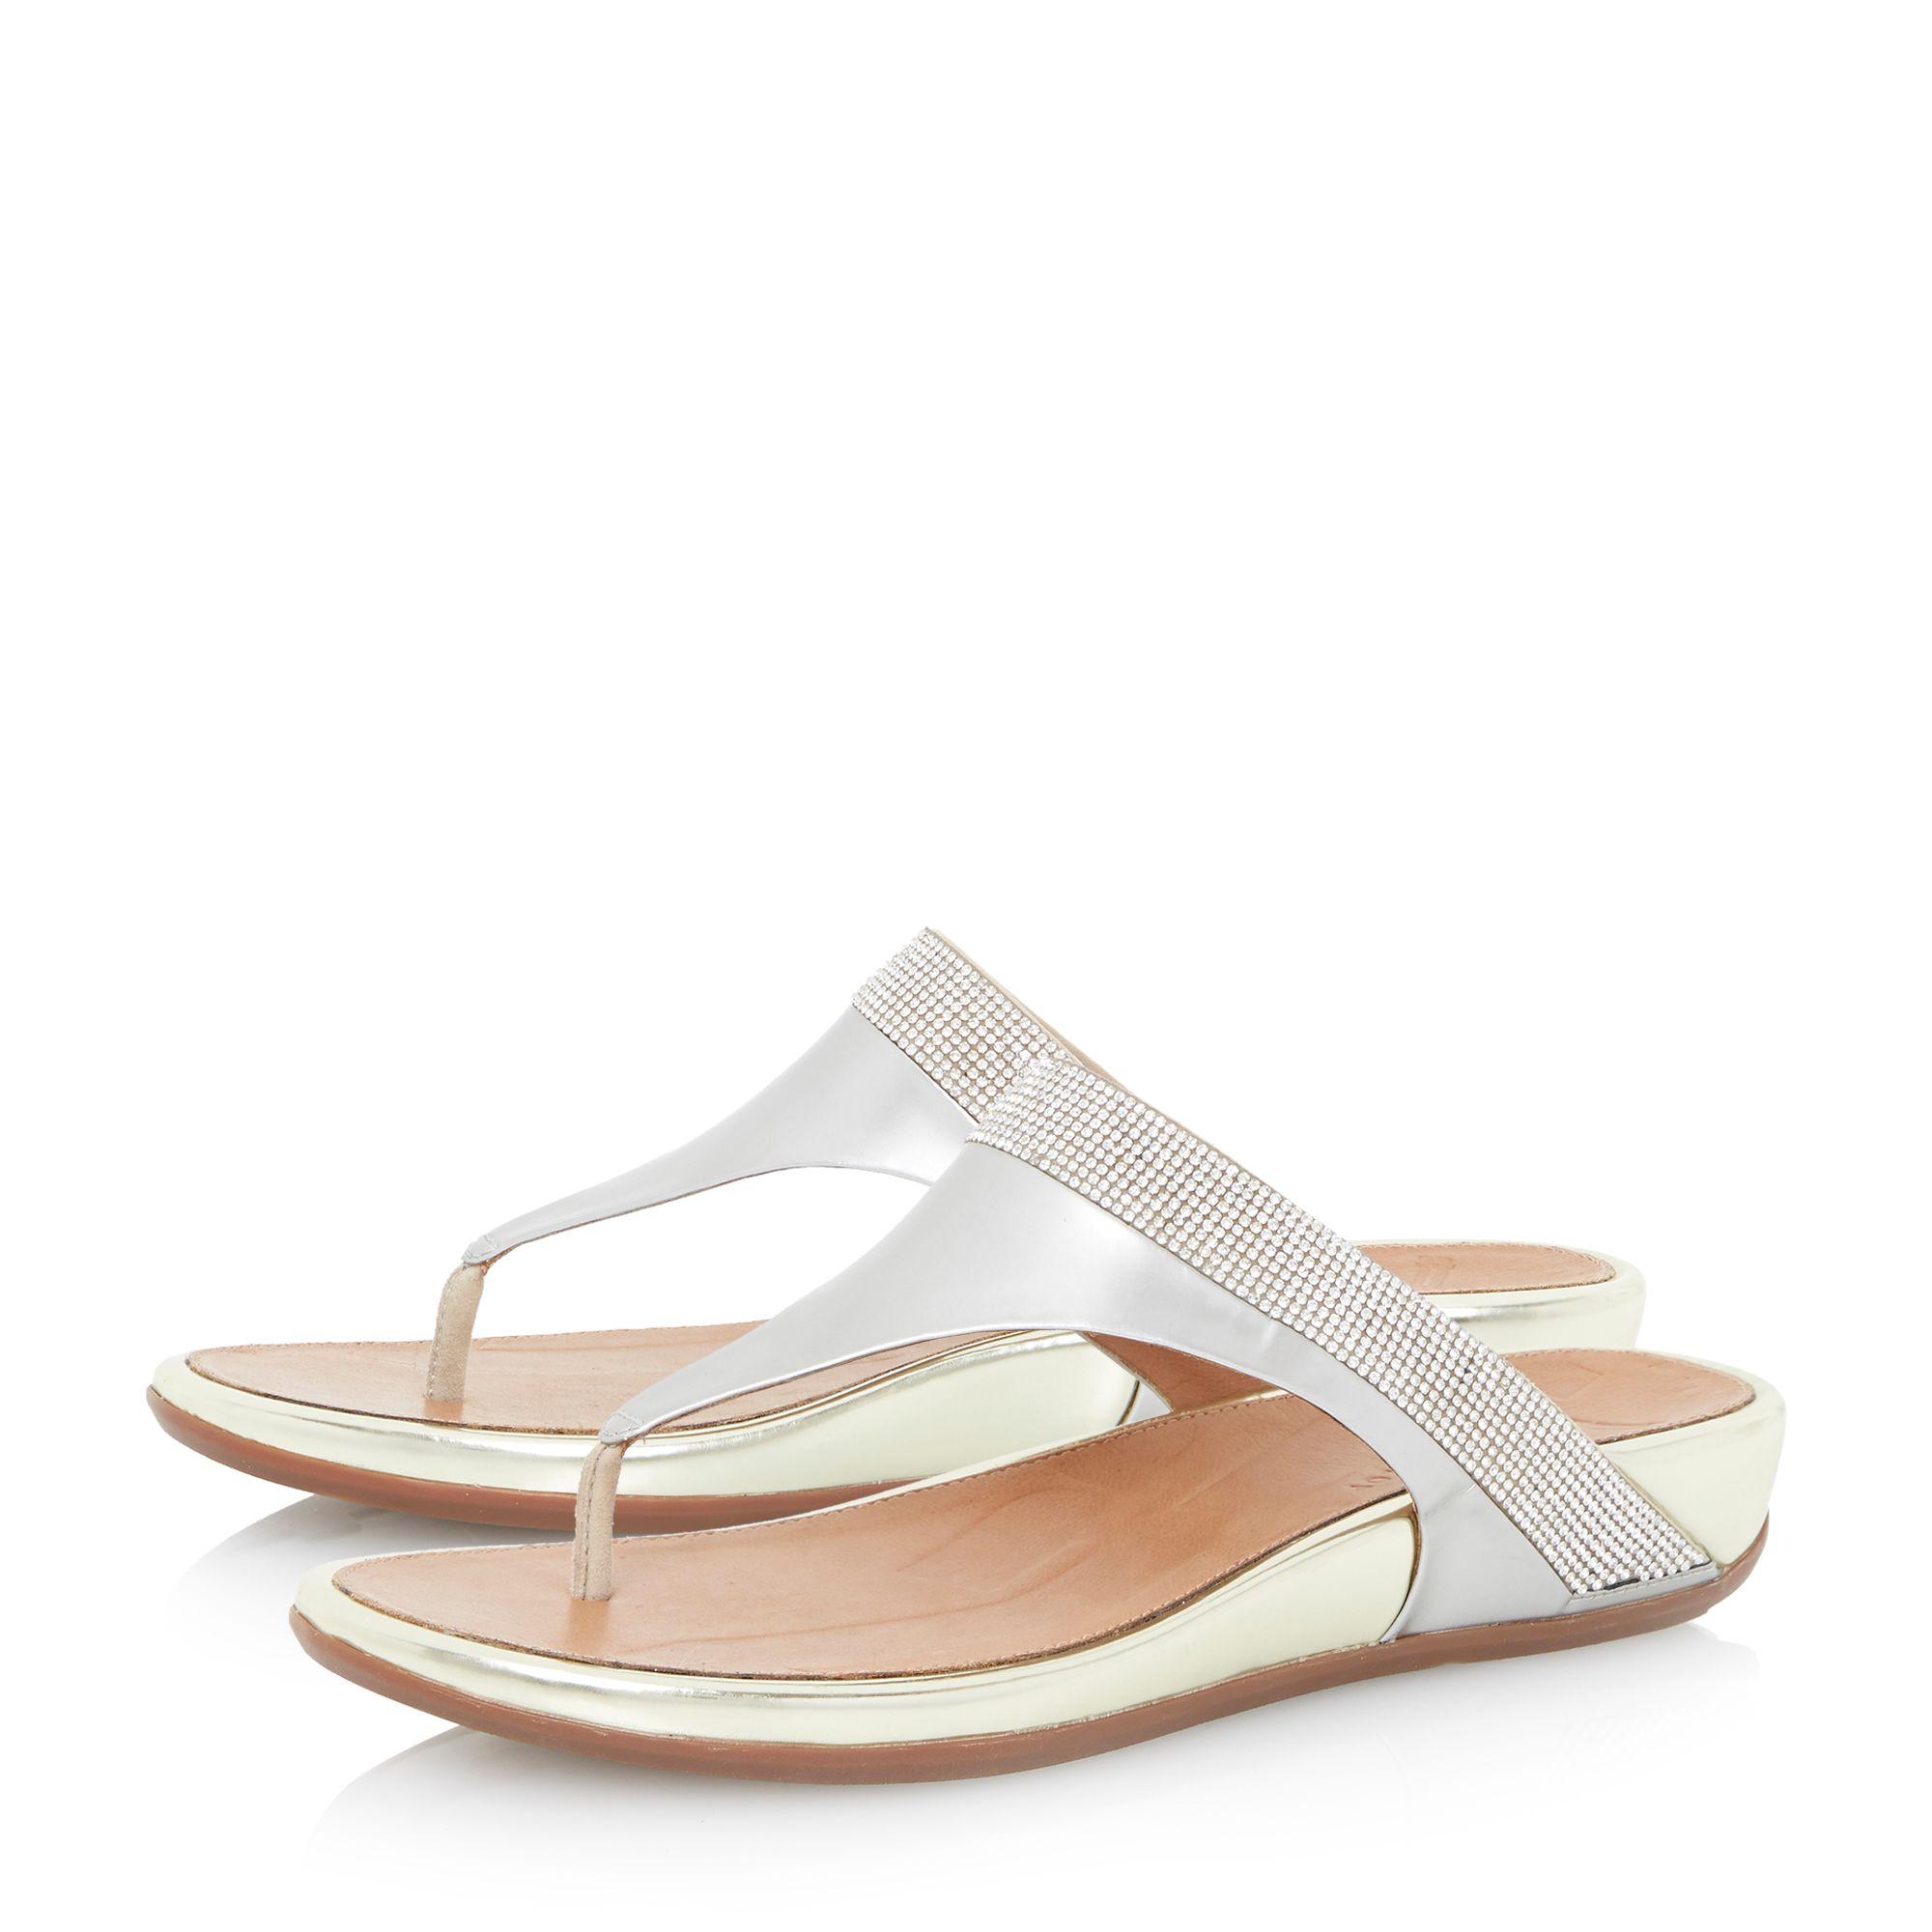 907808802 Fitflop Ff2 Crystal Banda Flat Sandals - www.mhr-usa.com